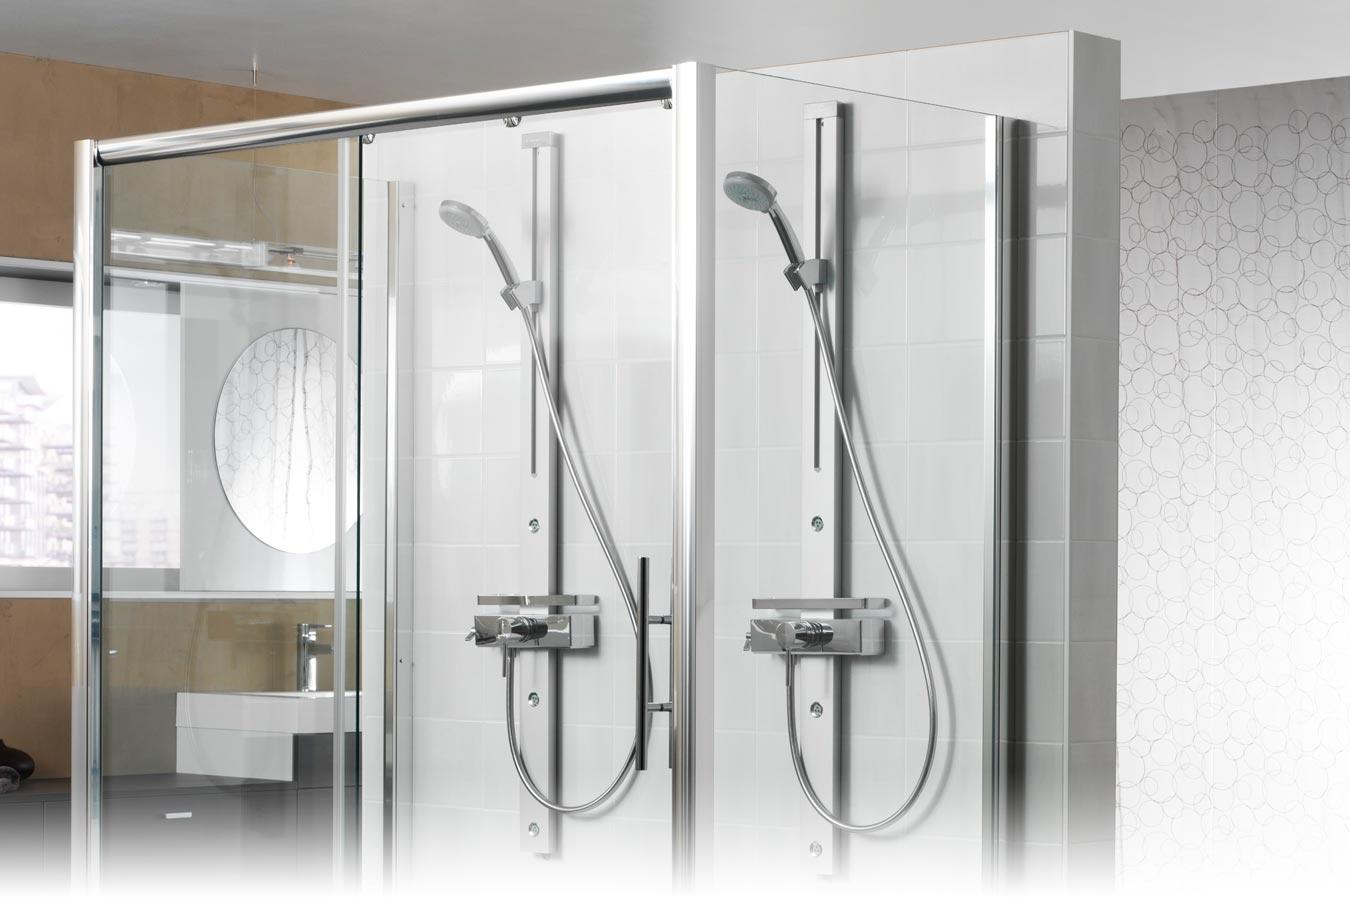 bain d tails essentiels baignoires perene lyon. Black Bedroom Furniture Sets. Home Design Ideas